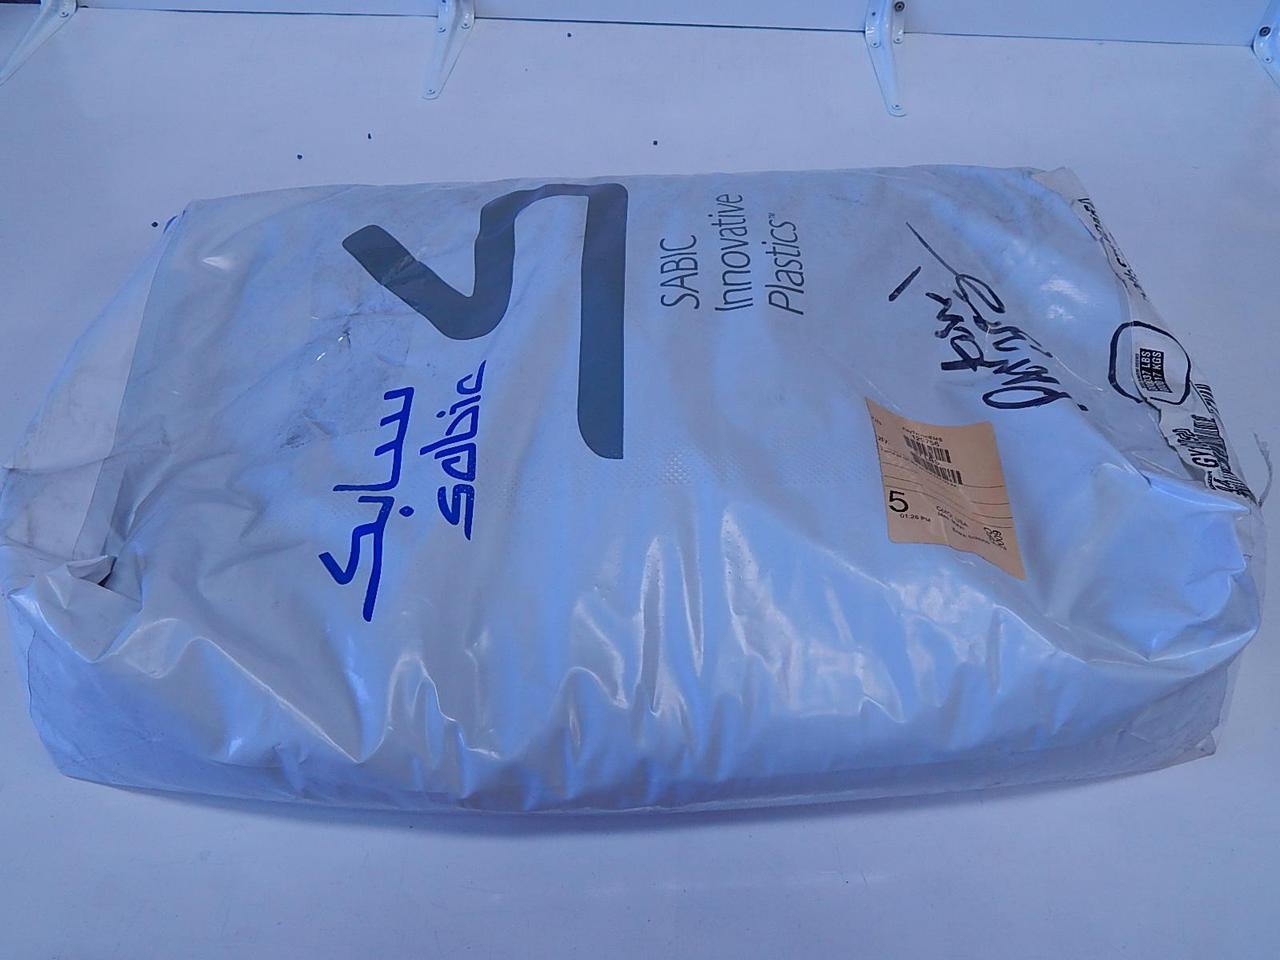 Sabic Innovative Plastics 940-GY1C090, 129756 Plastic Resin 37 lbs T89324